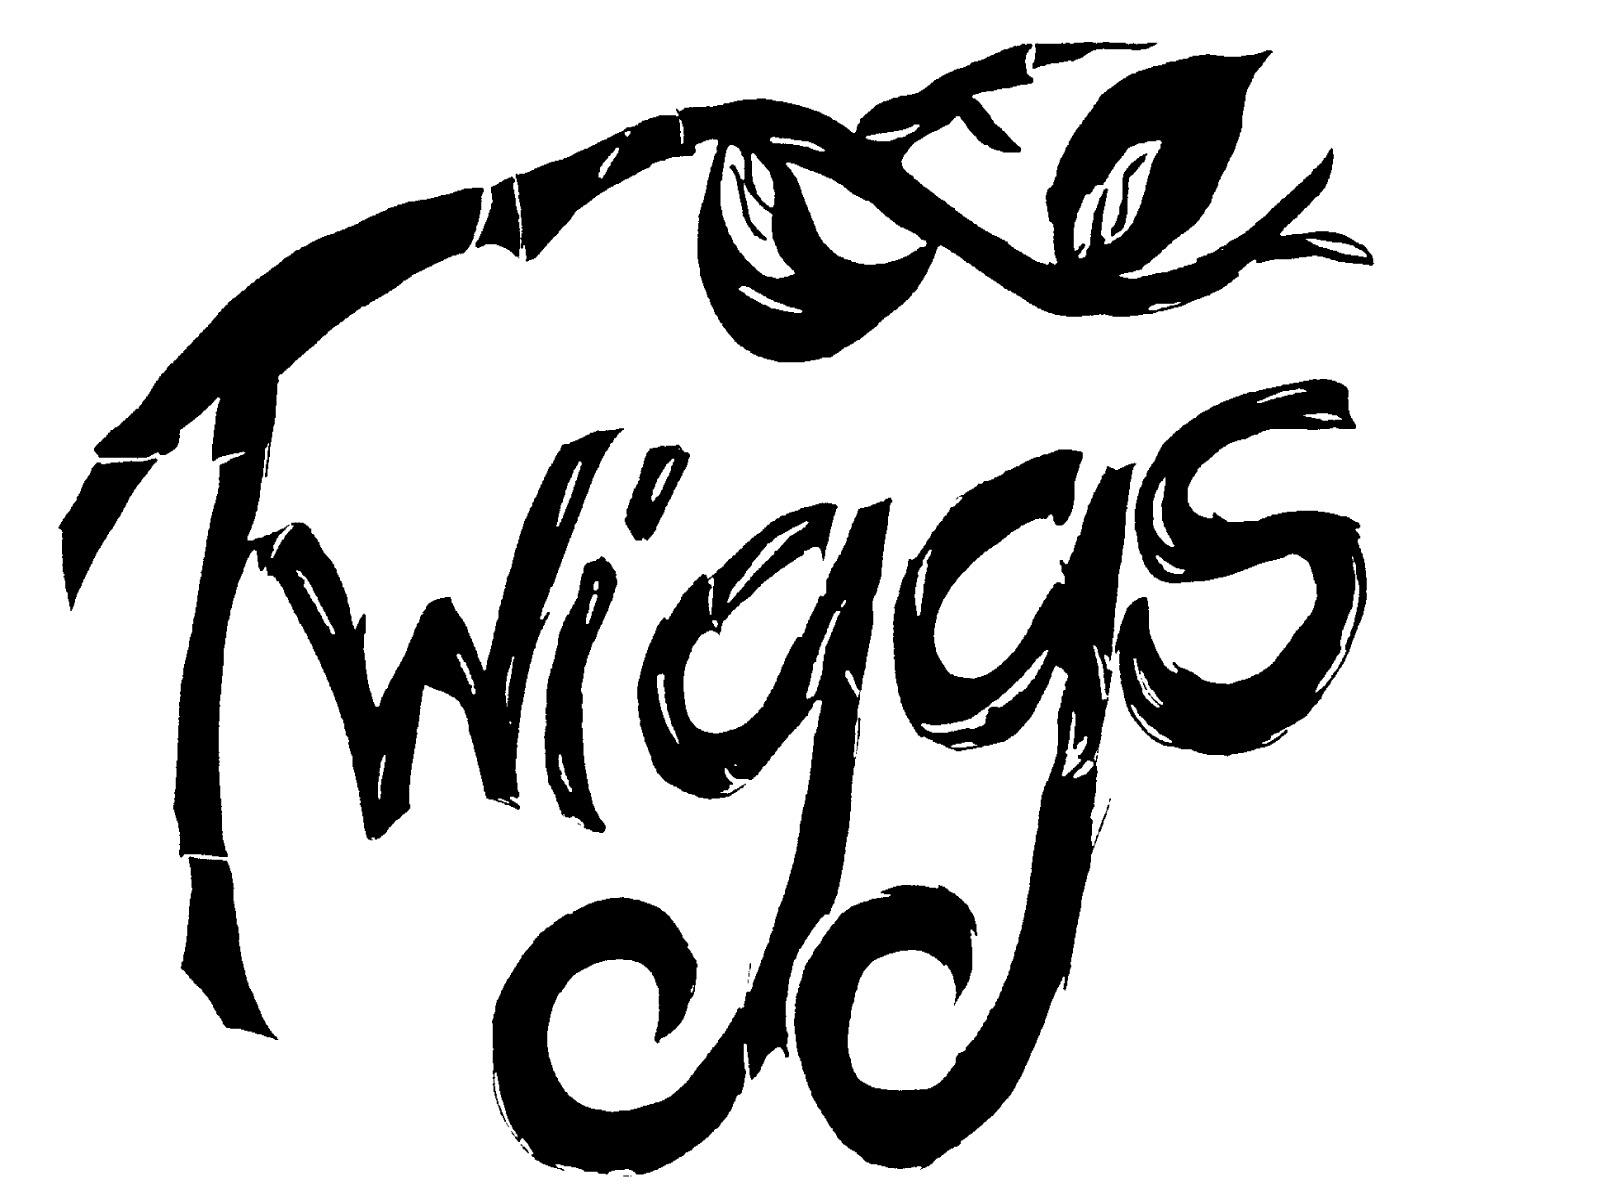 Twigg only blk.jpg